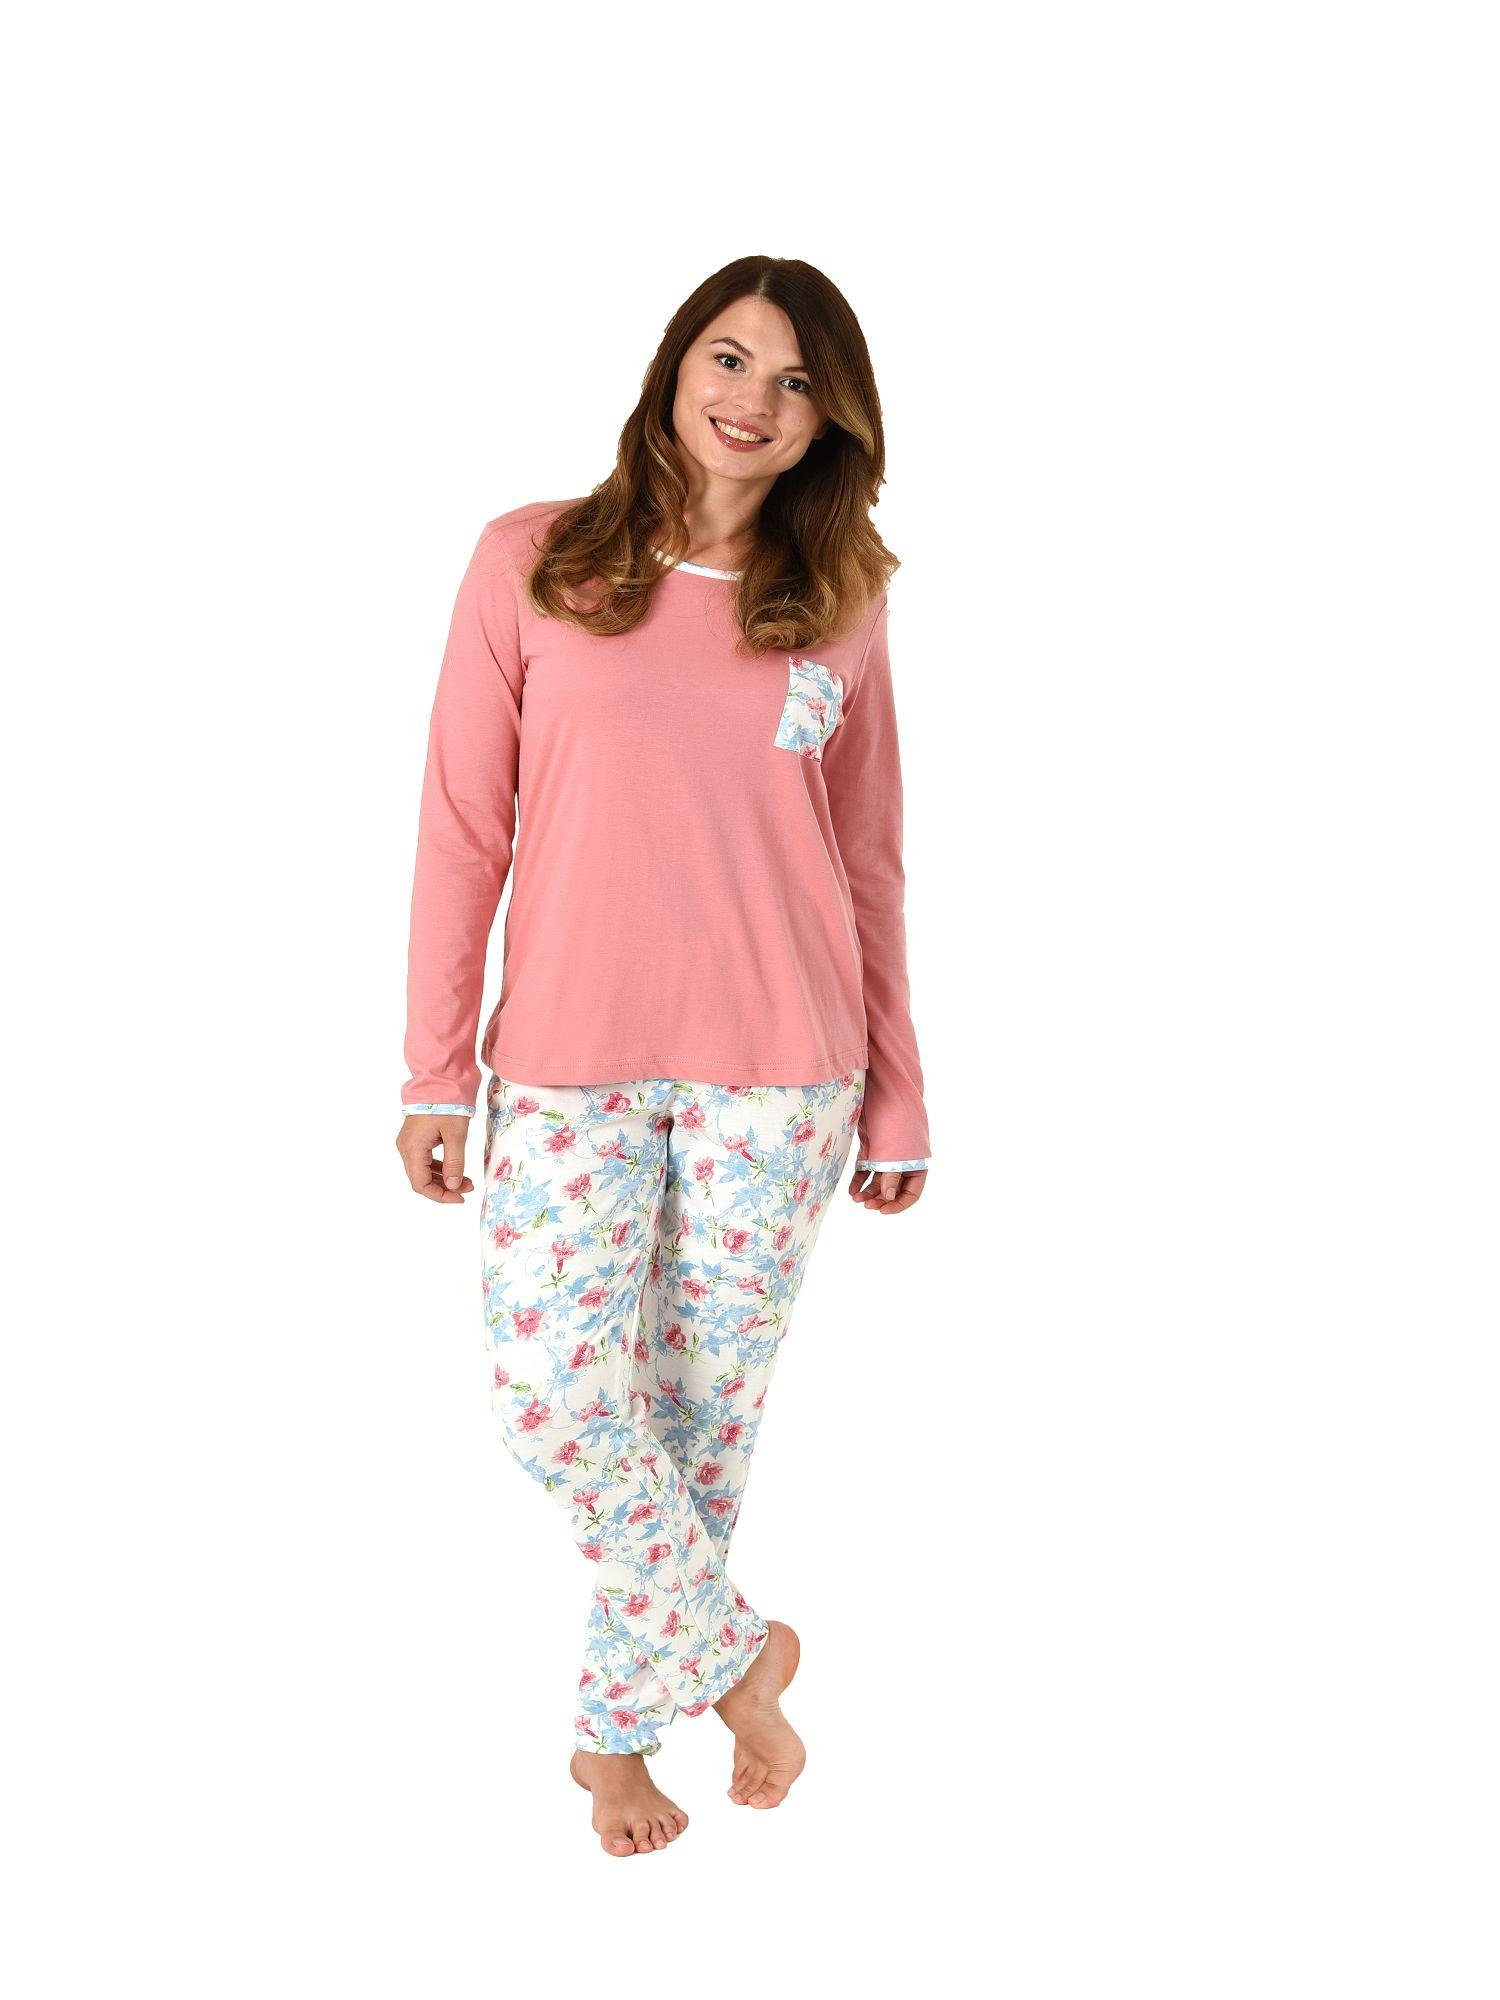 newest 52044 bc4c9 Normann Damen Pyjama Schlafanzug langarm 181 201 90 302